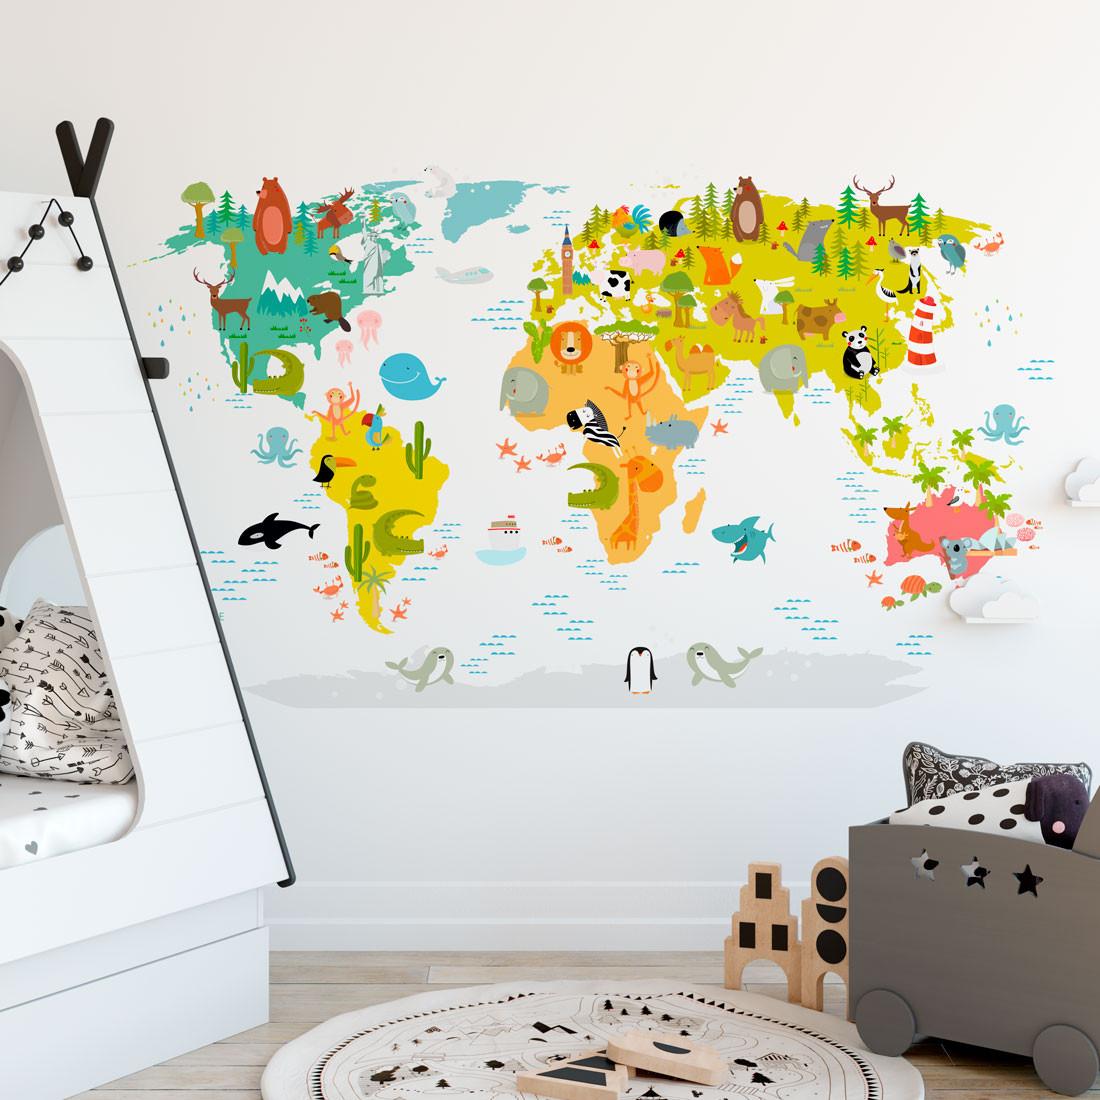 Adesivo de Parede Infantil Mapa Mundi